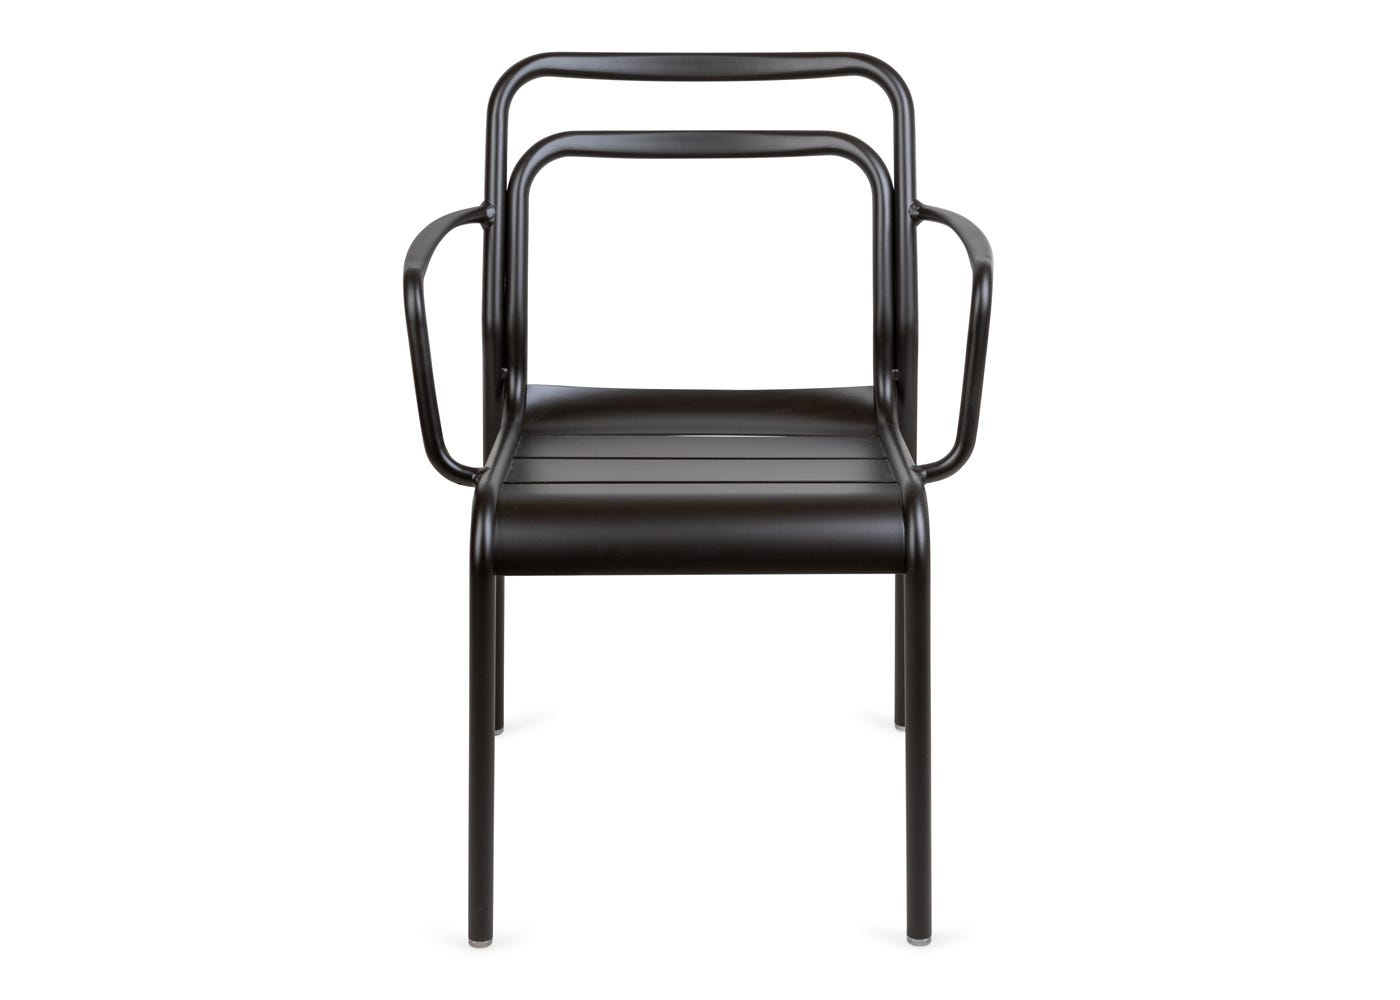 As shown: Petra outdoor armchair in dark grey - Front profile.